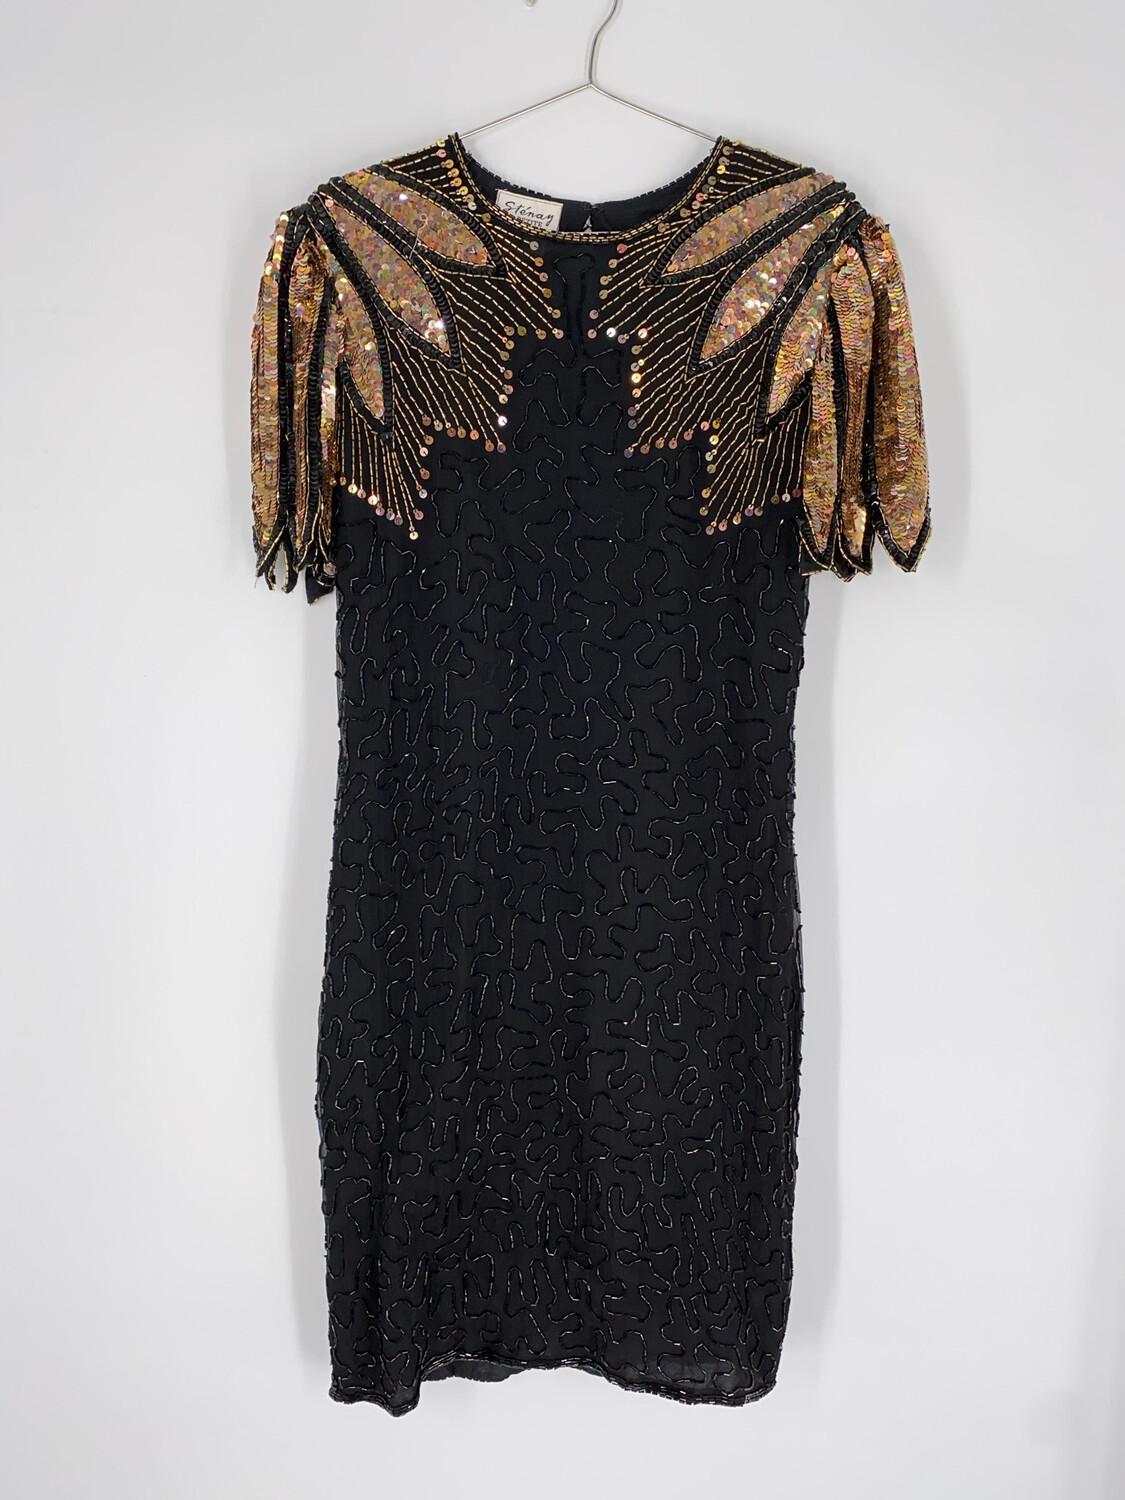 Stenay Petite Black & Gold Dress Size M